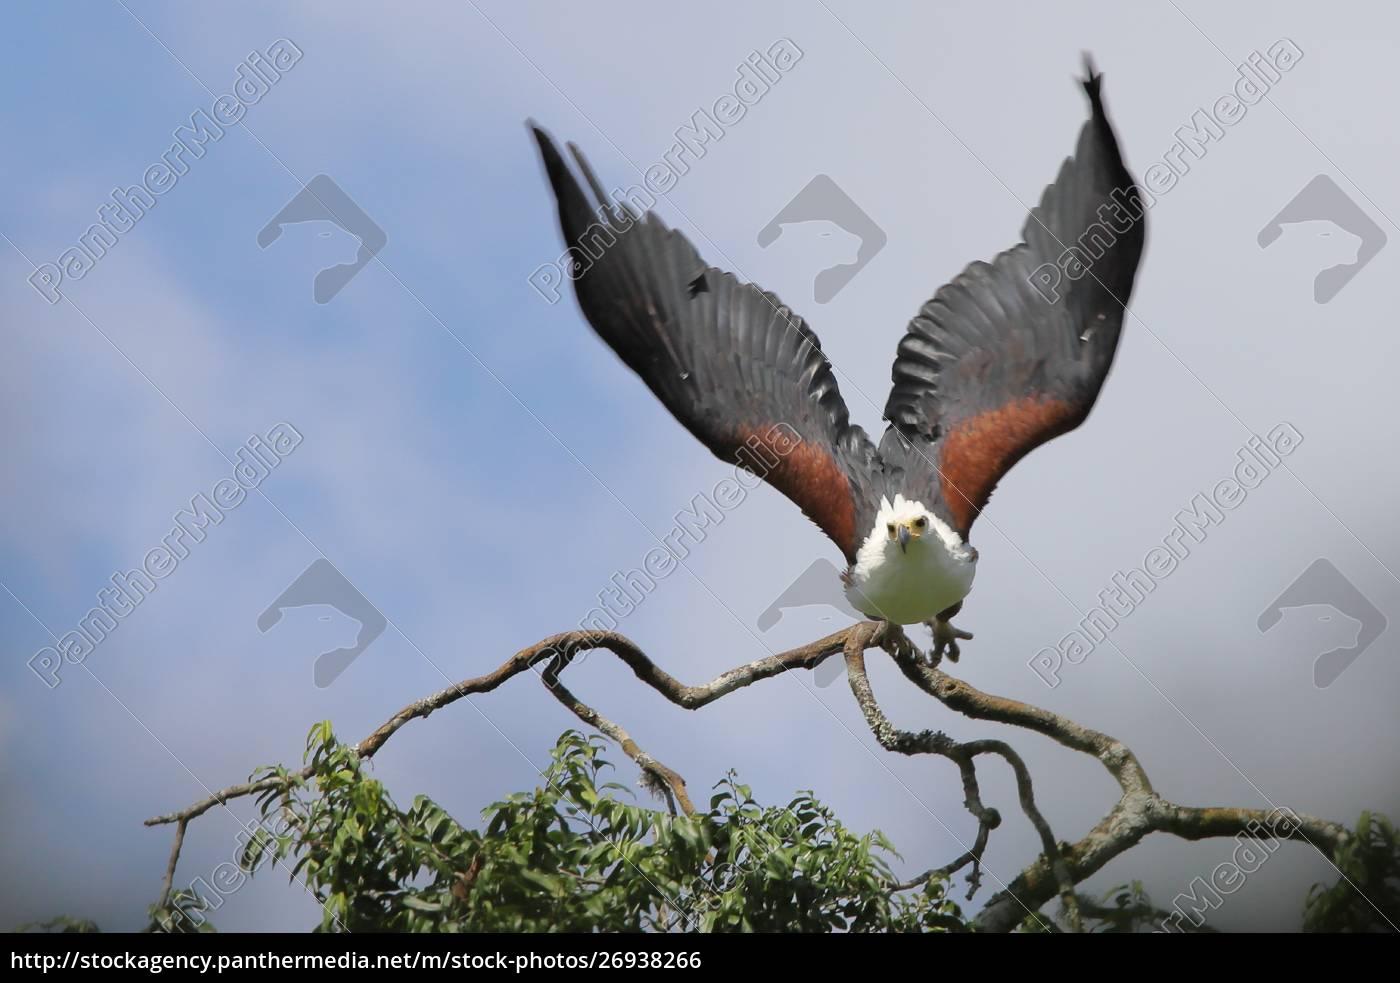 afrikanischer, seeadler, im, flug - 26938266